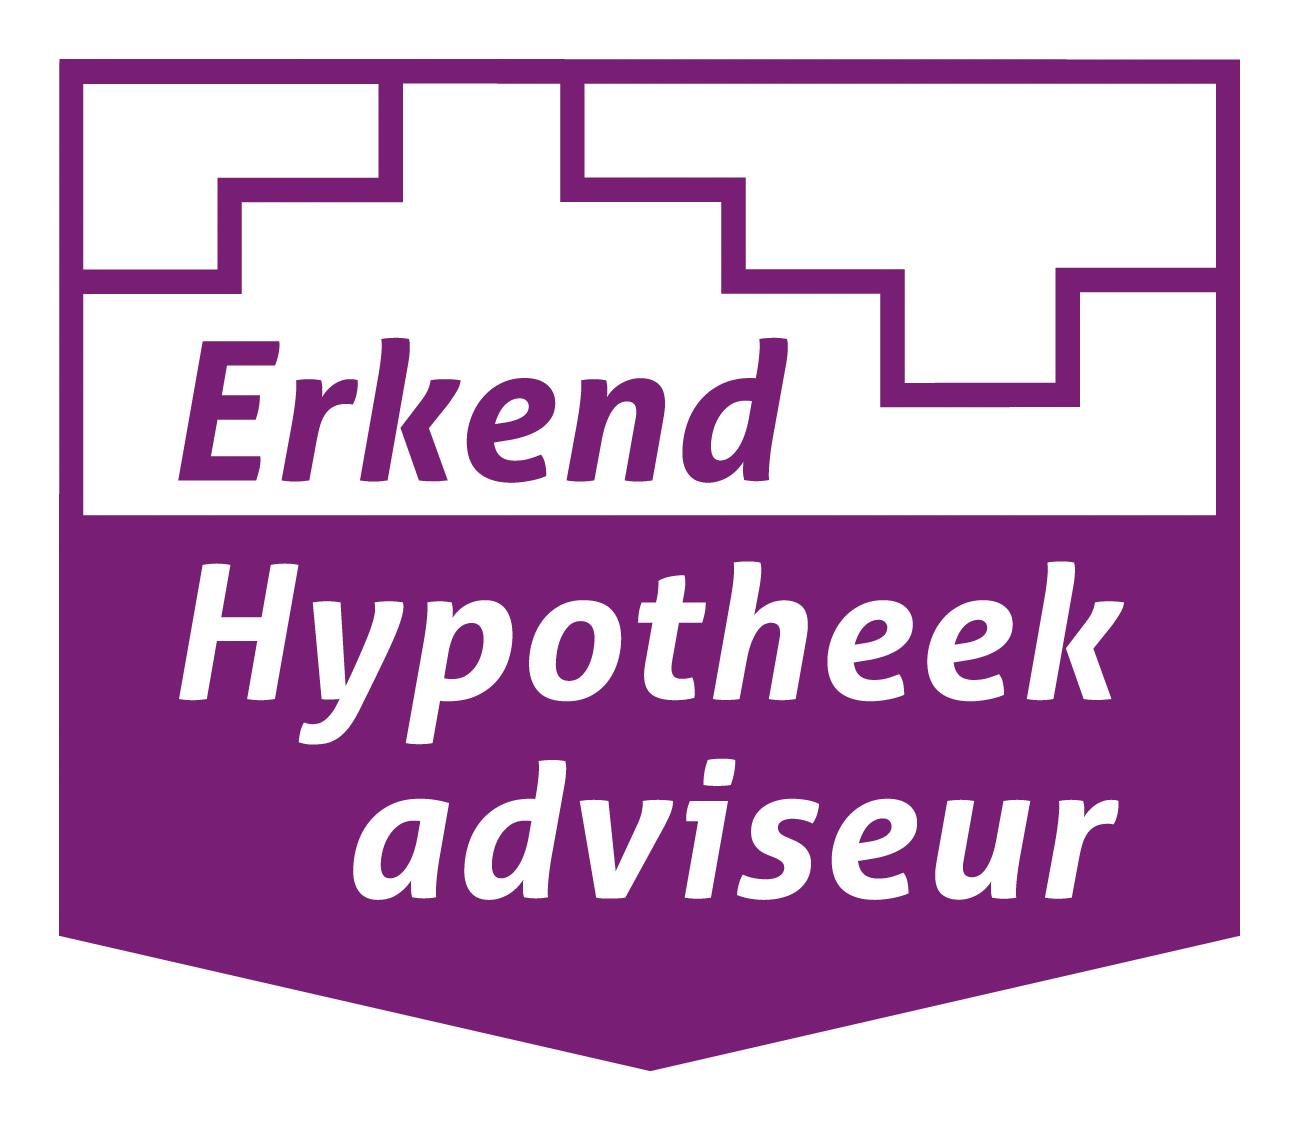 erkend-hypotheek-adviseur